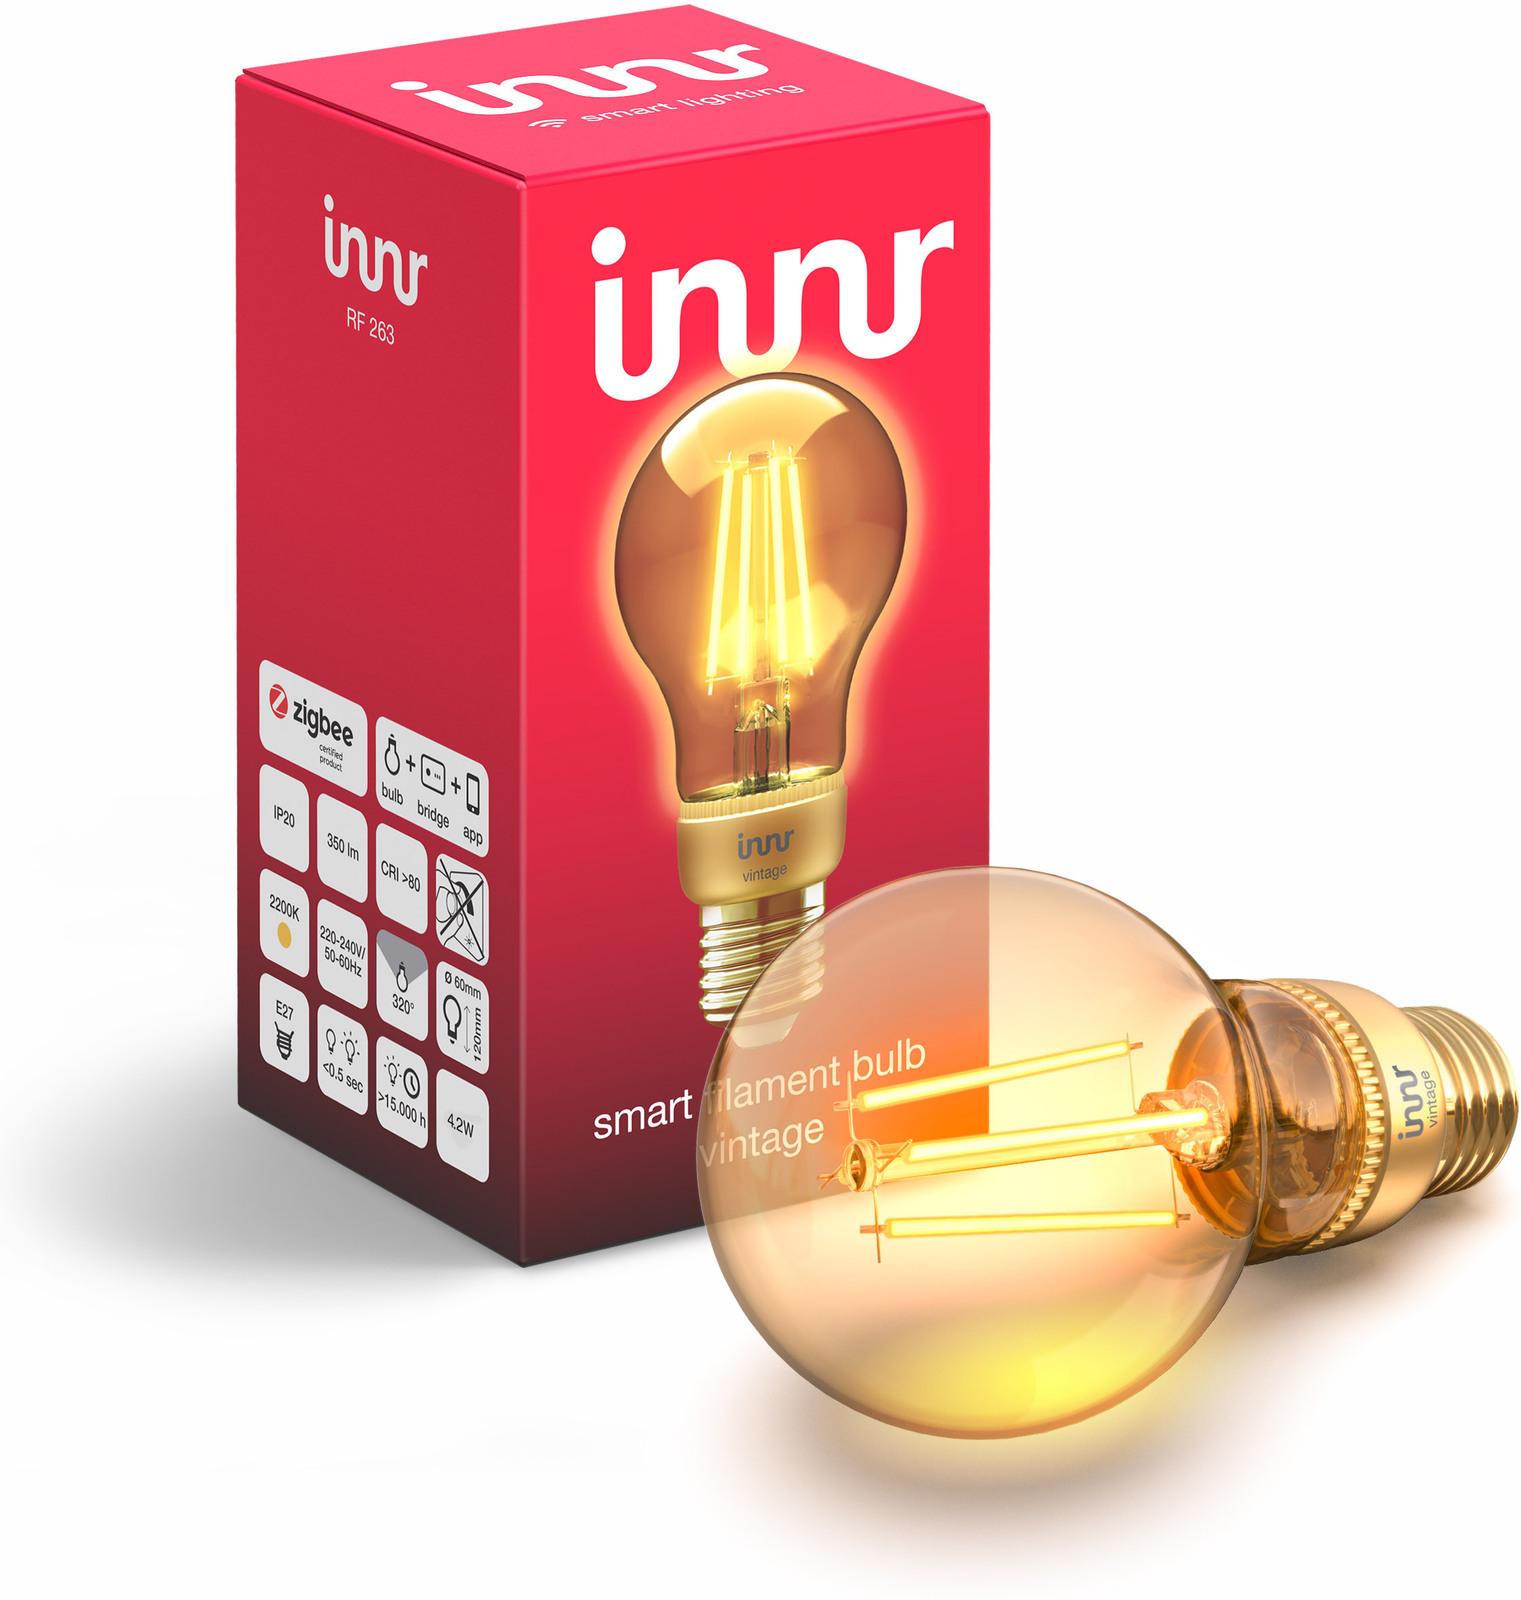 INNR Lighting 1x E27 Smart Filament Bulb Vintage, 2.200K, 350 Lm Z3.0 RF 263 - eet01